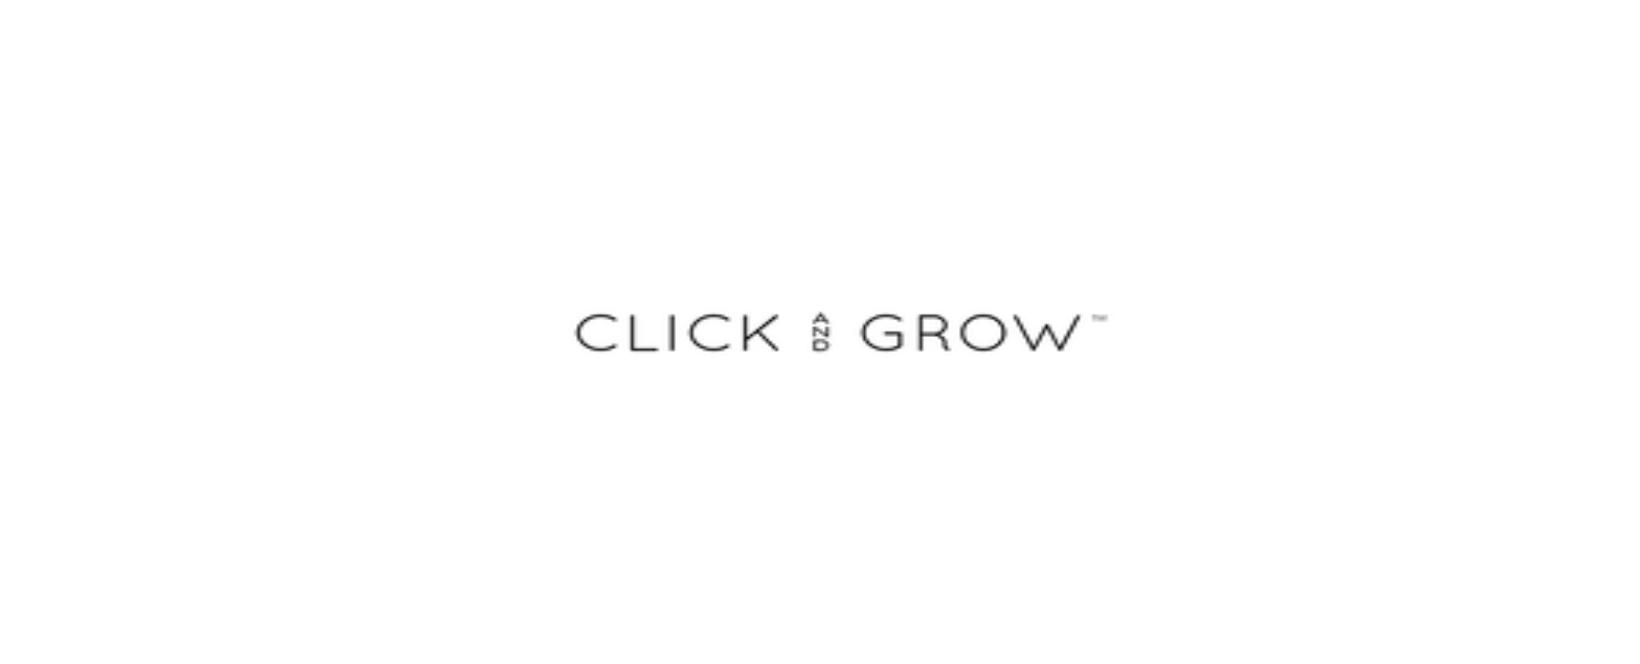 Click & Grow Discount Codes 2021